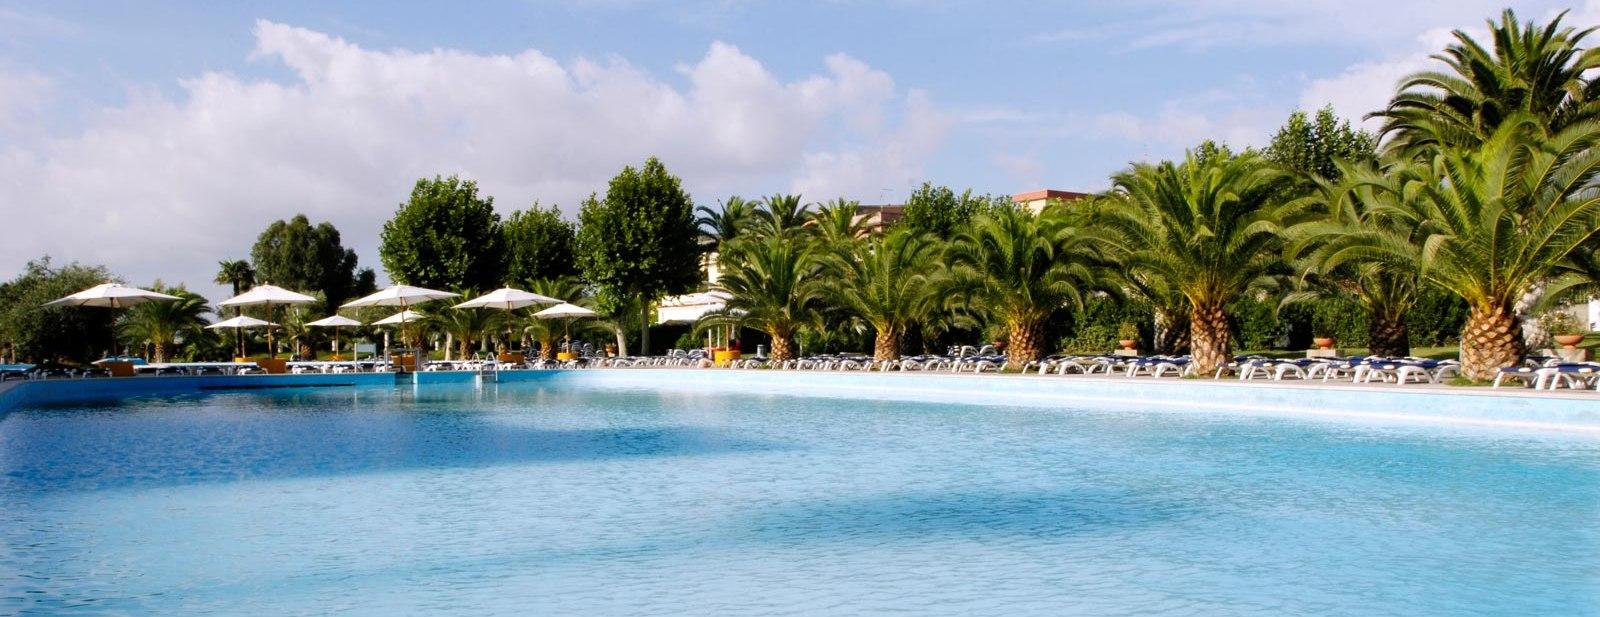 piscina terme di tivoli